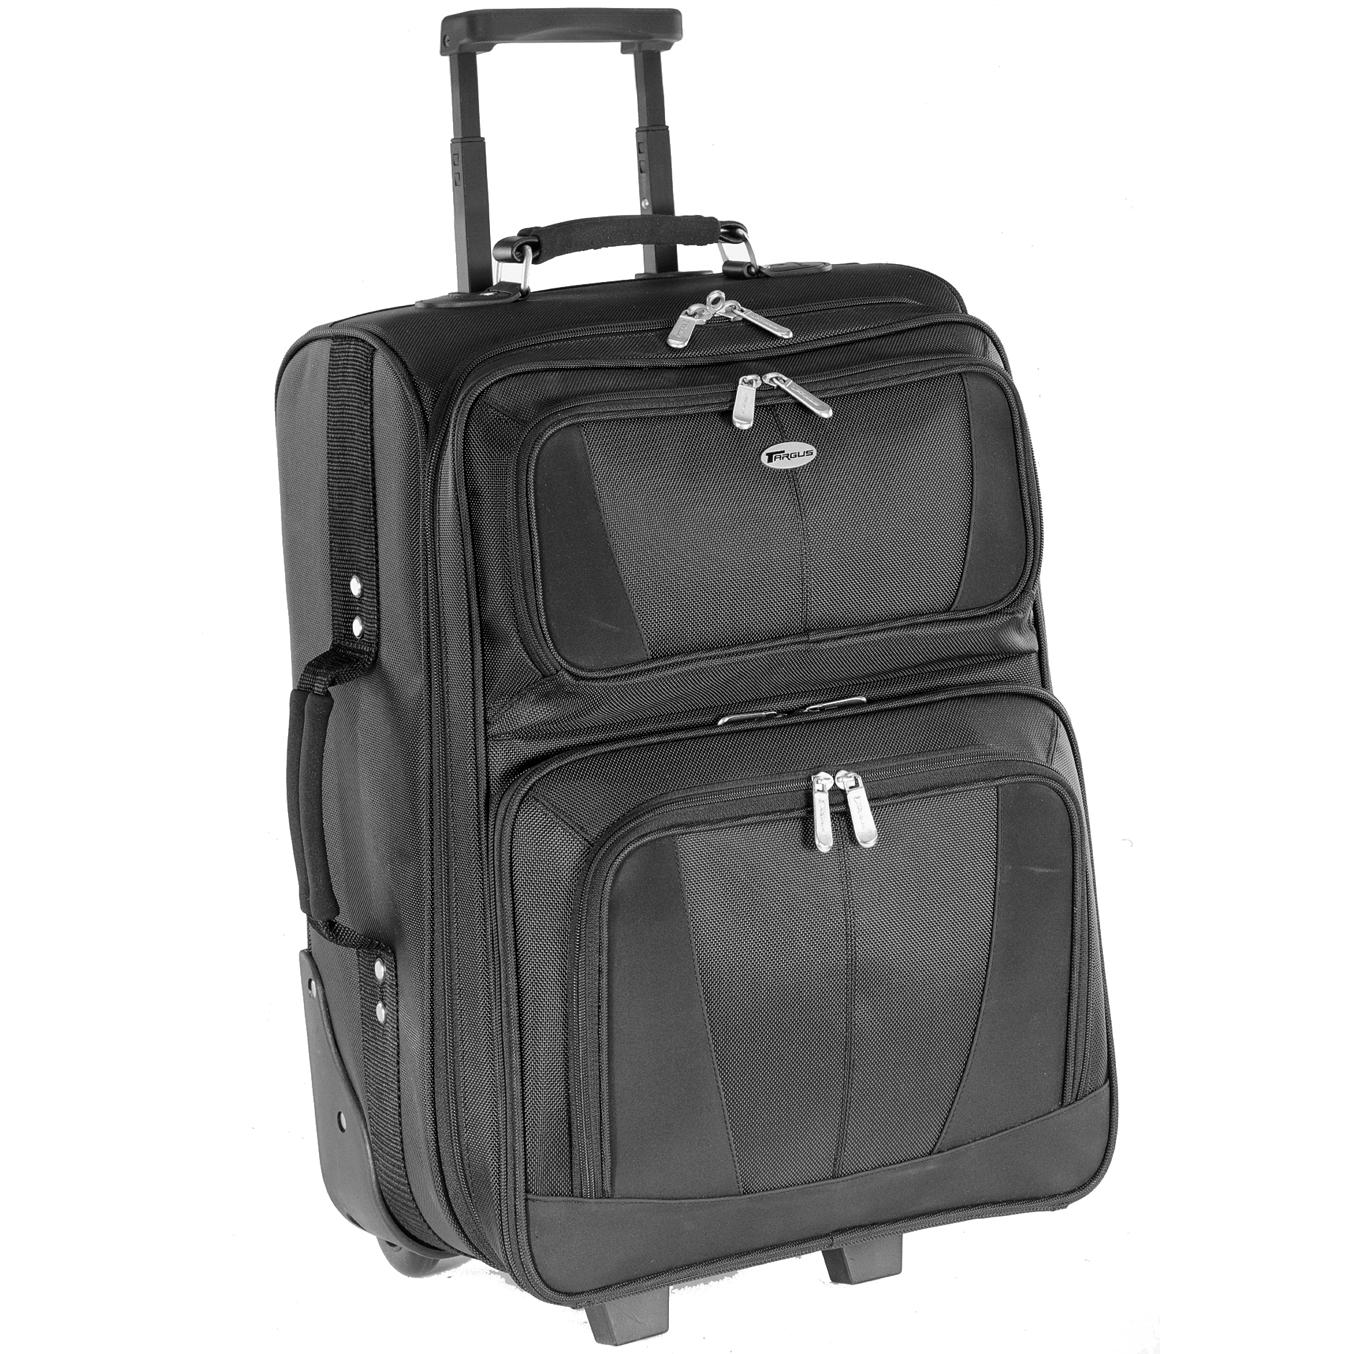 17 Trademark Ii Overnight Rolling Laptop Case Tm2900 Black Rollers Targus